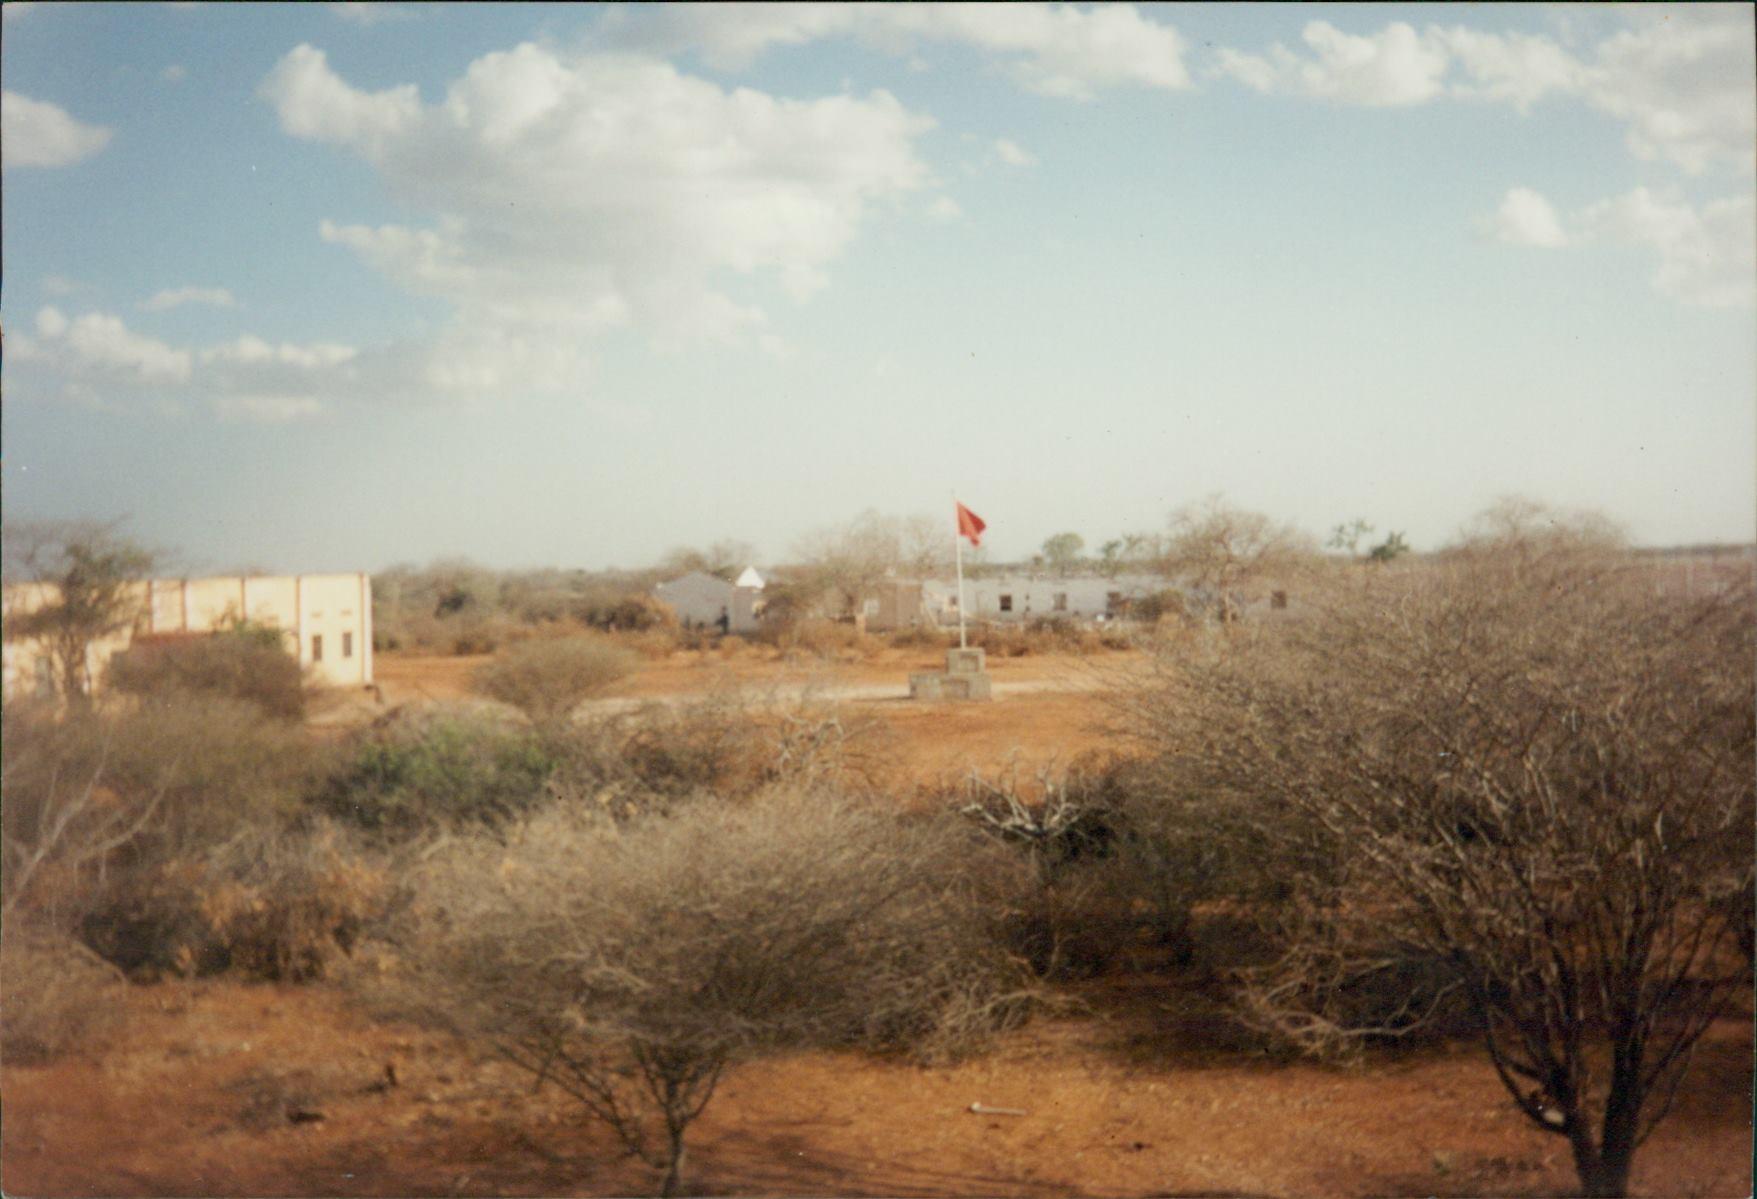 Les FAR en Somalie - Page 2 30310